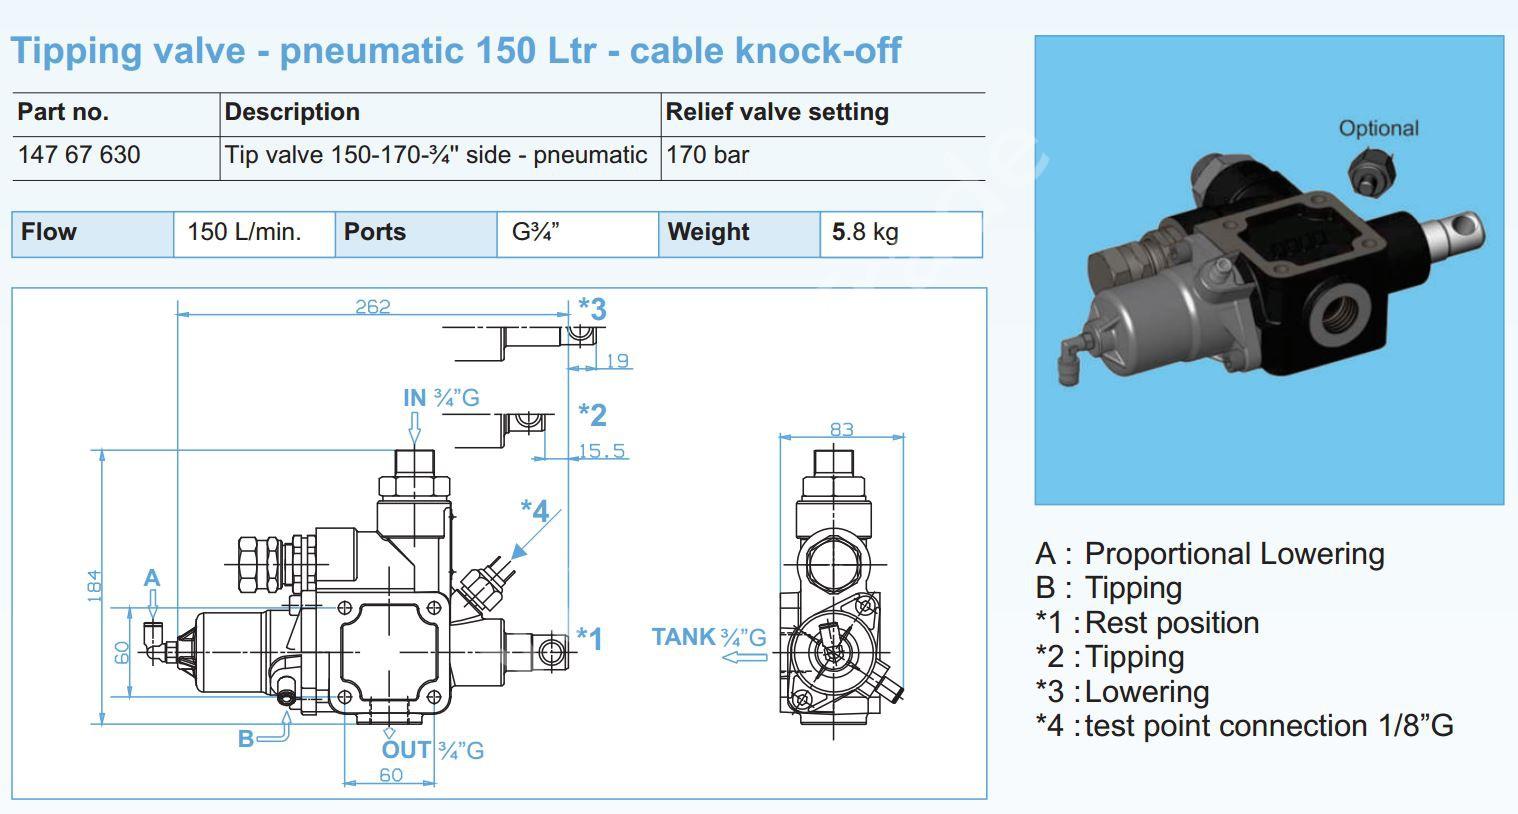 147-67-630 Клапан HYVA 150-170-3-4 side-pneumatic